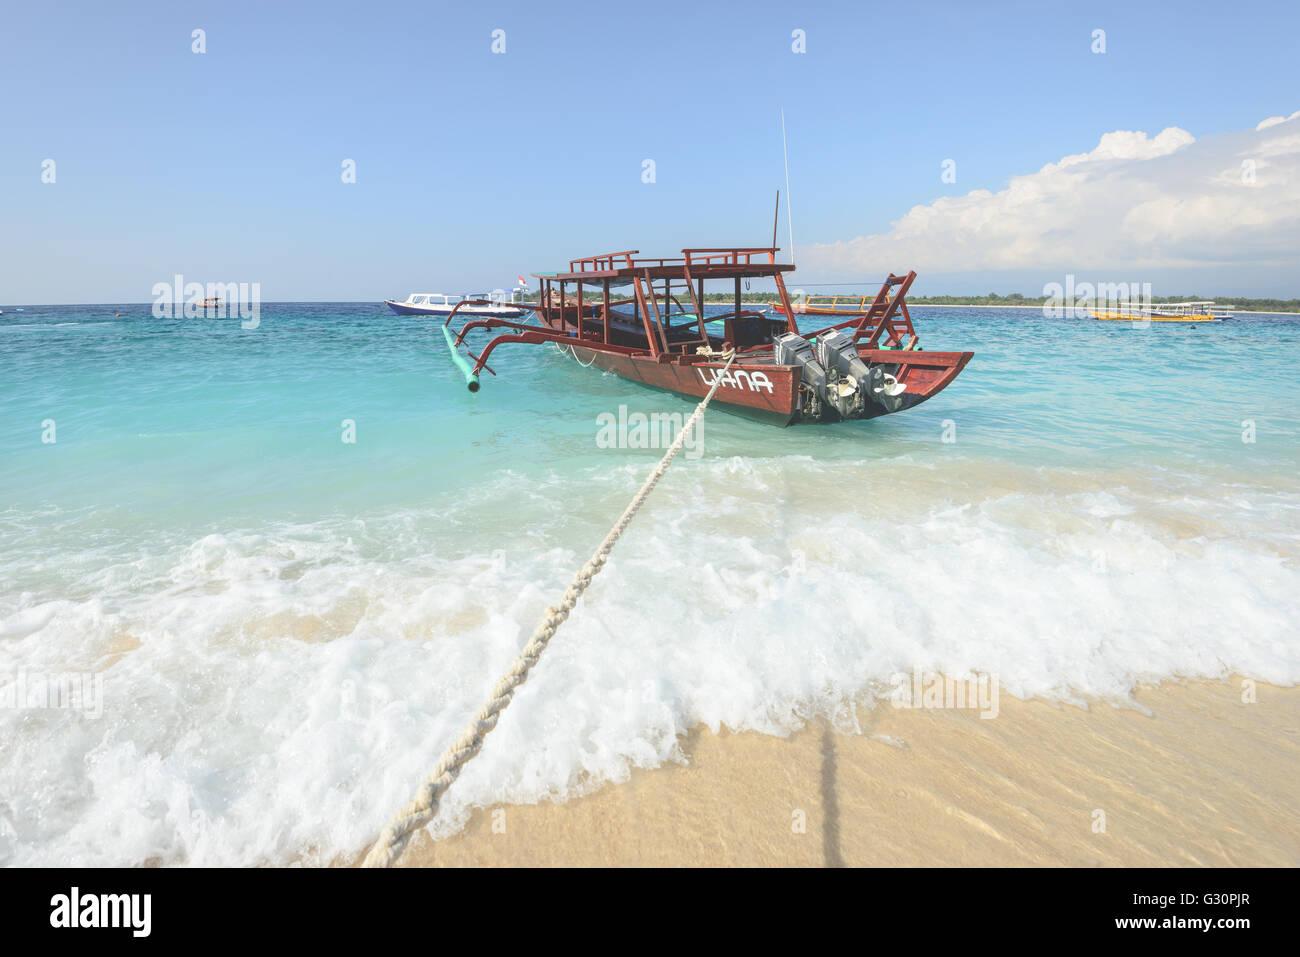 Boats anchored off Gili trawangan island in Indonesia - Stock Image